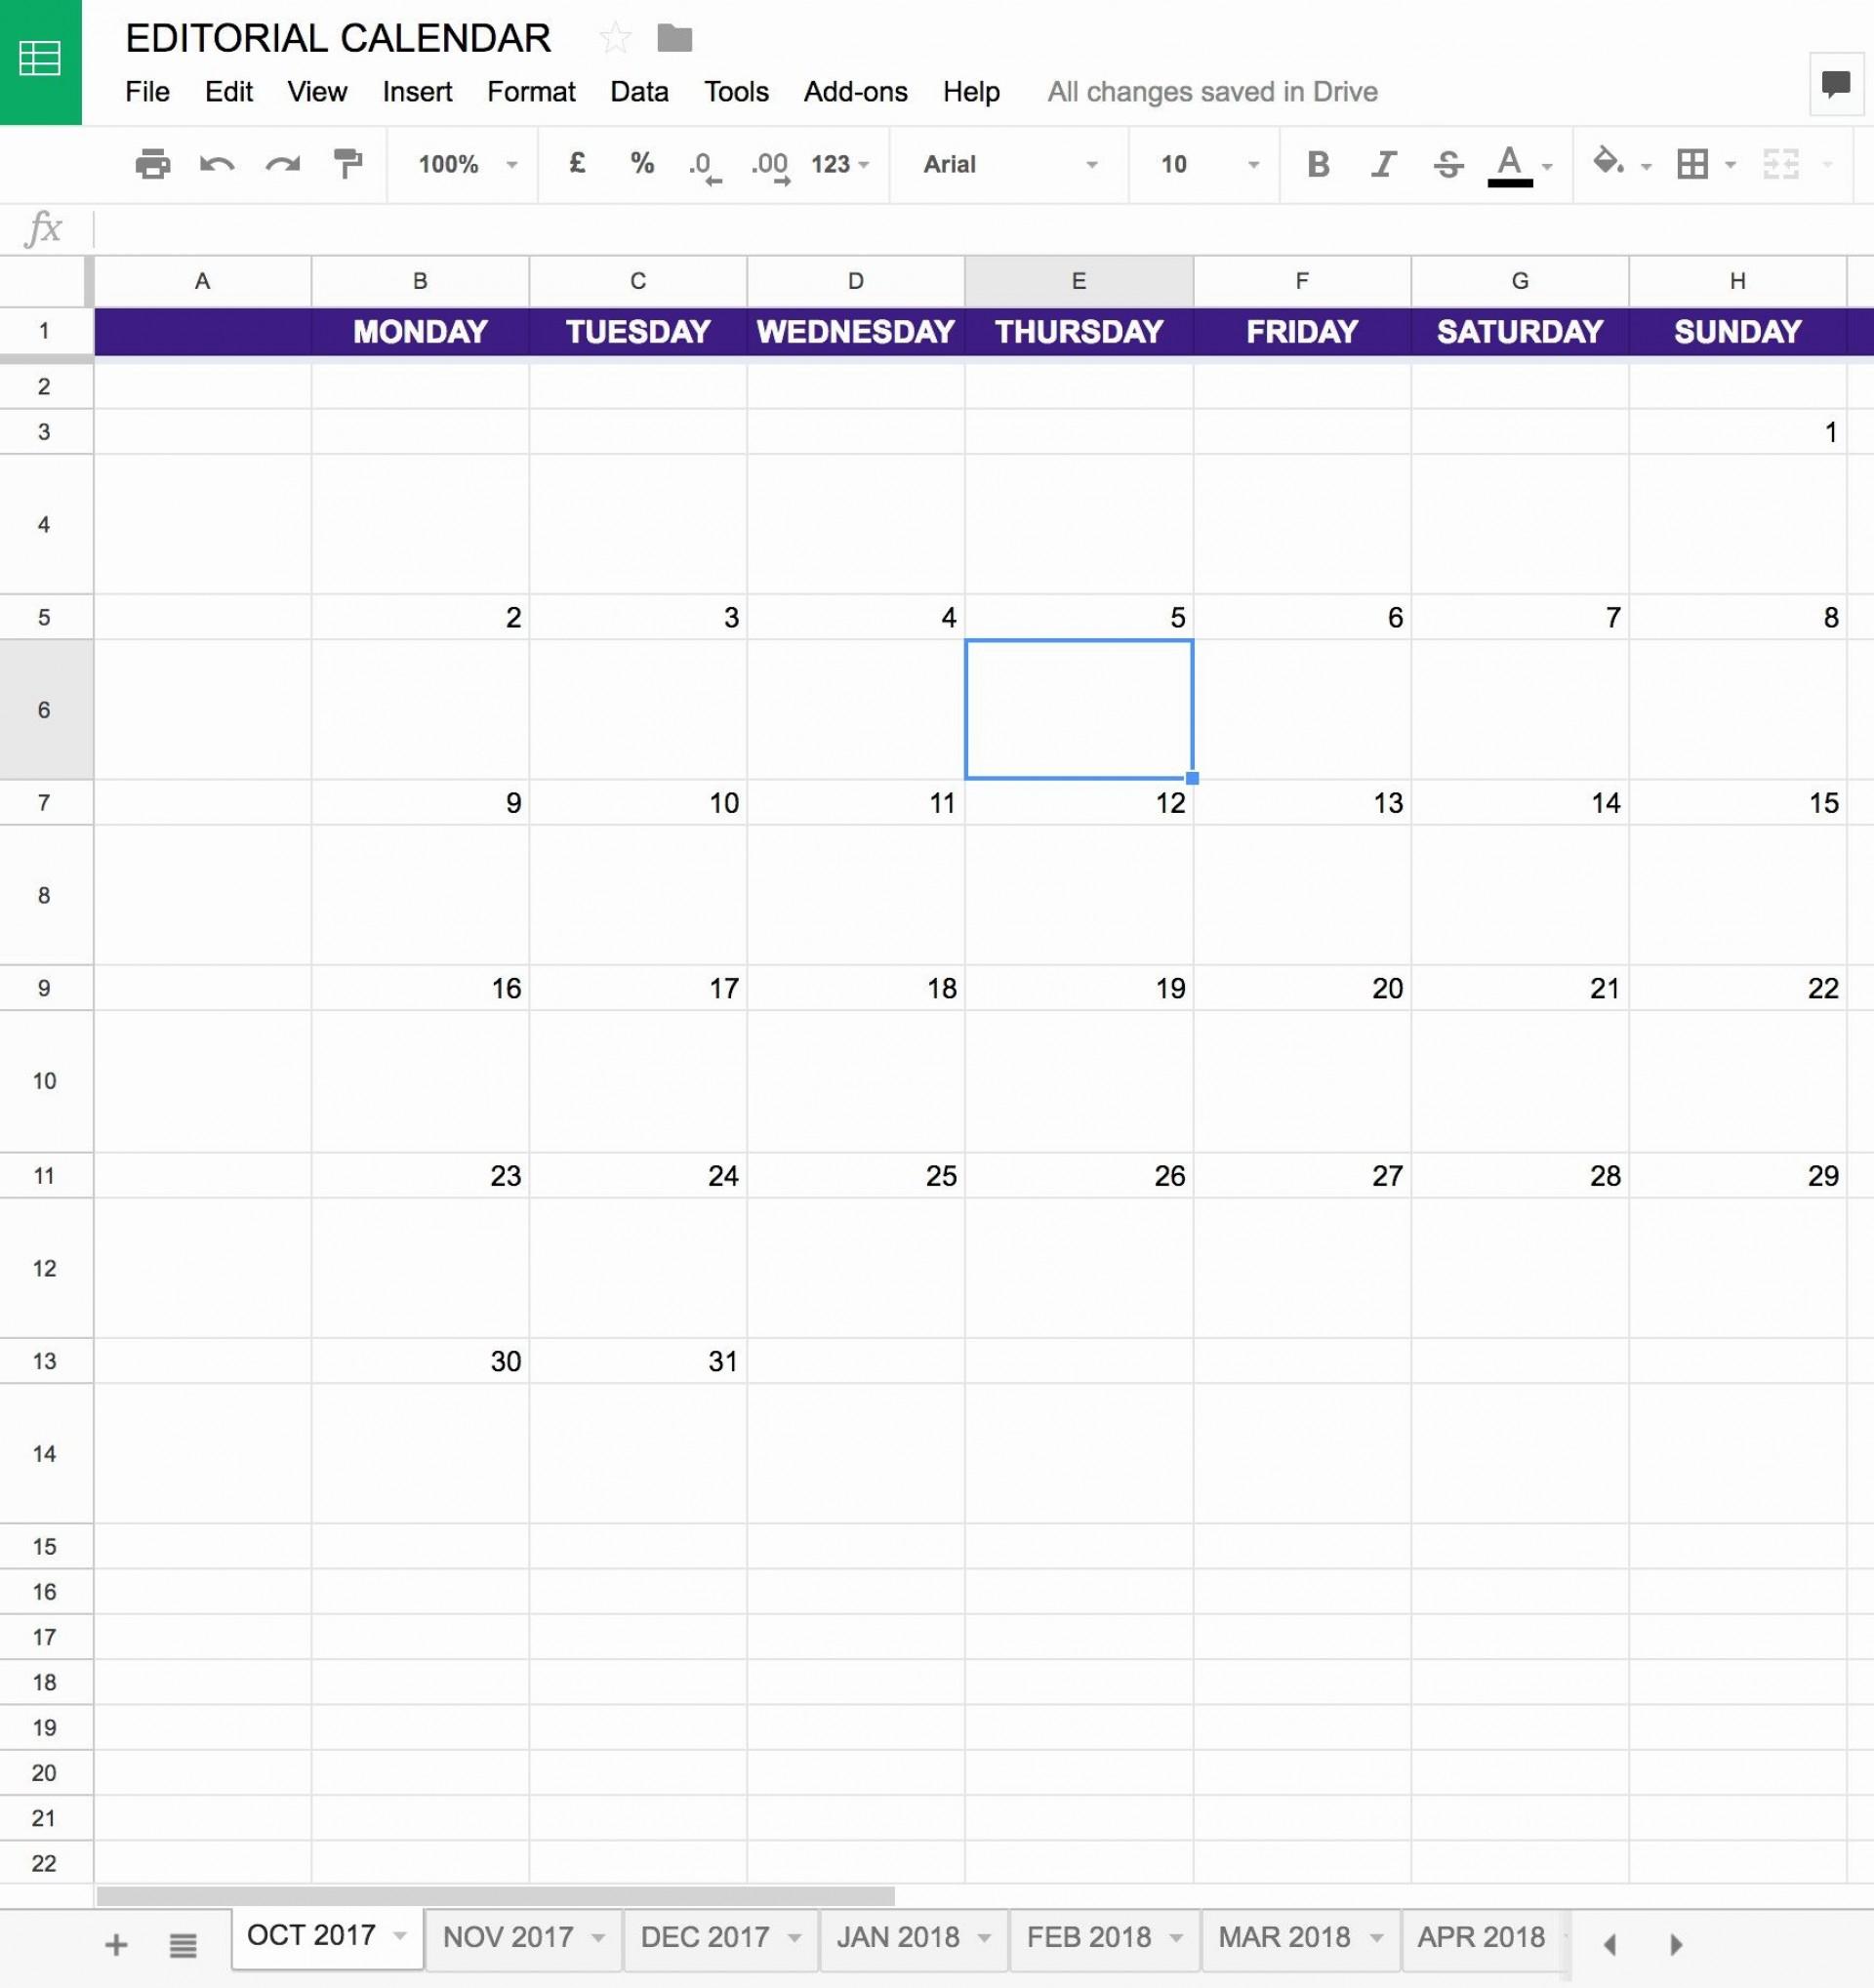 006 Fantastic Google Calendar Template 2017 Design 1920